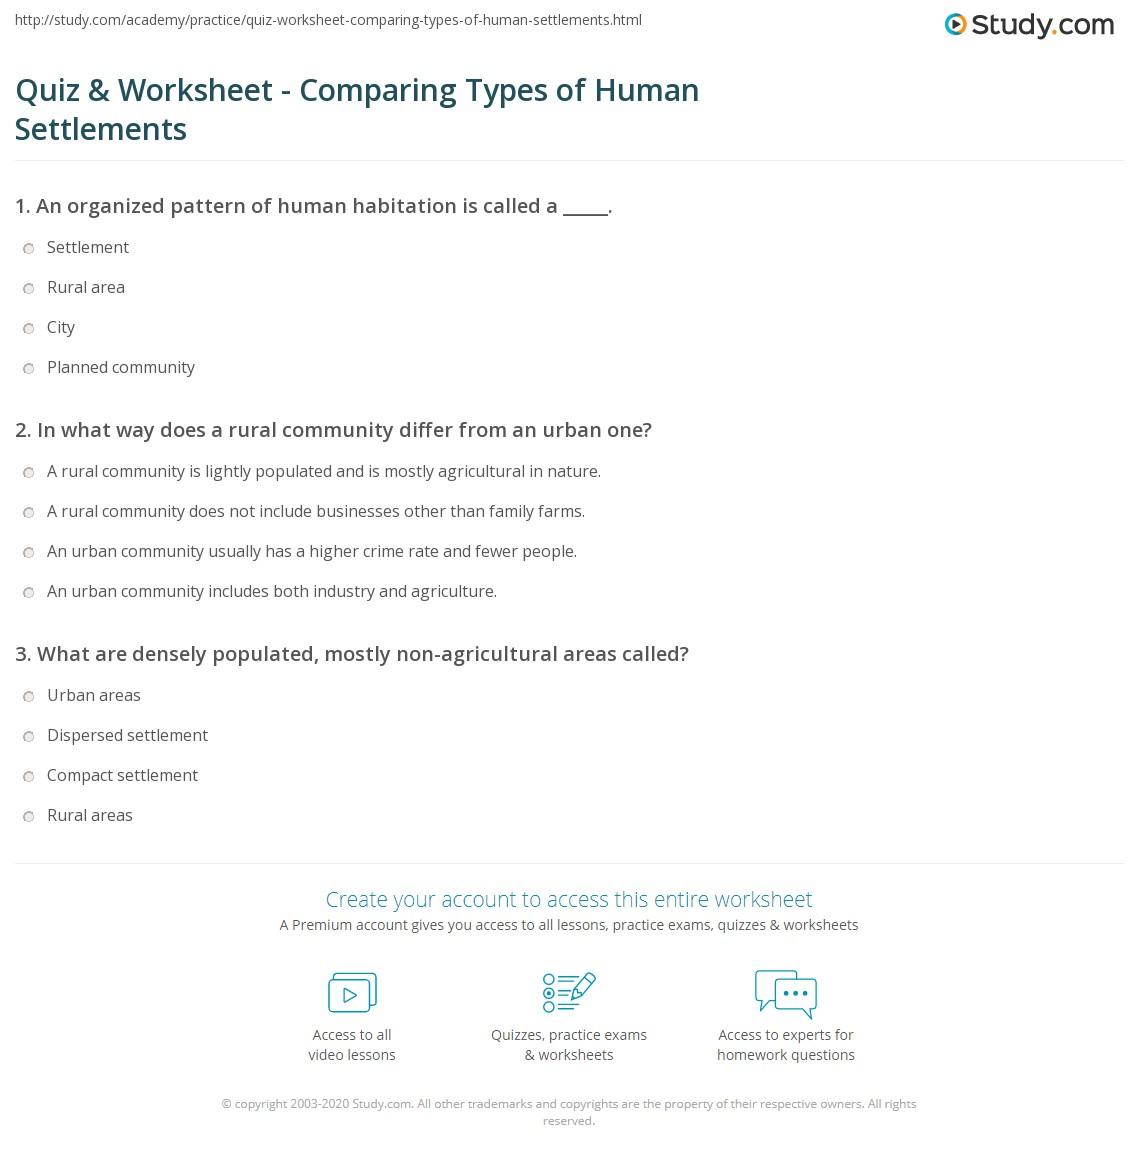 Quiz & Worksheet - Comparing Types of Human Settlements | Study.com